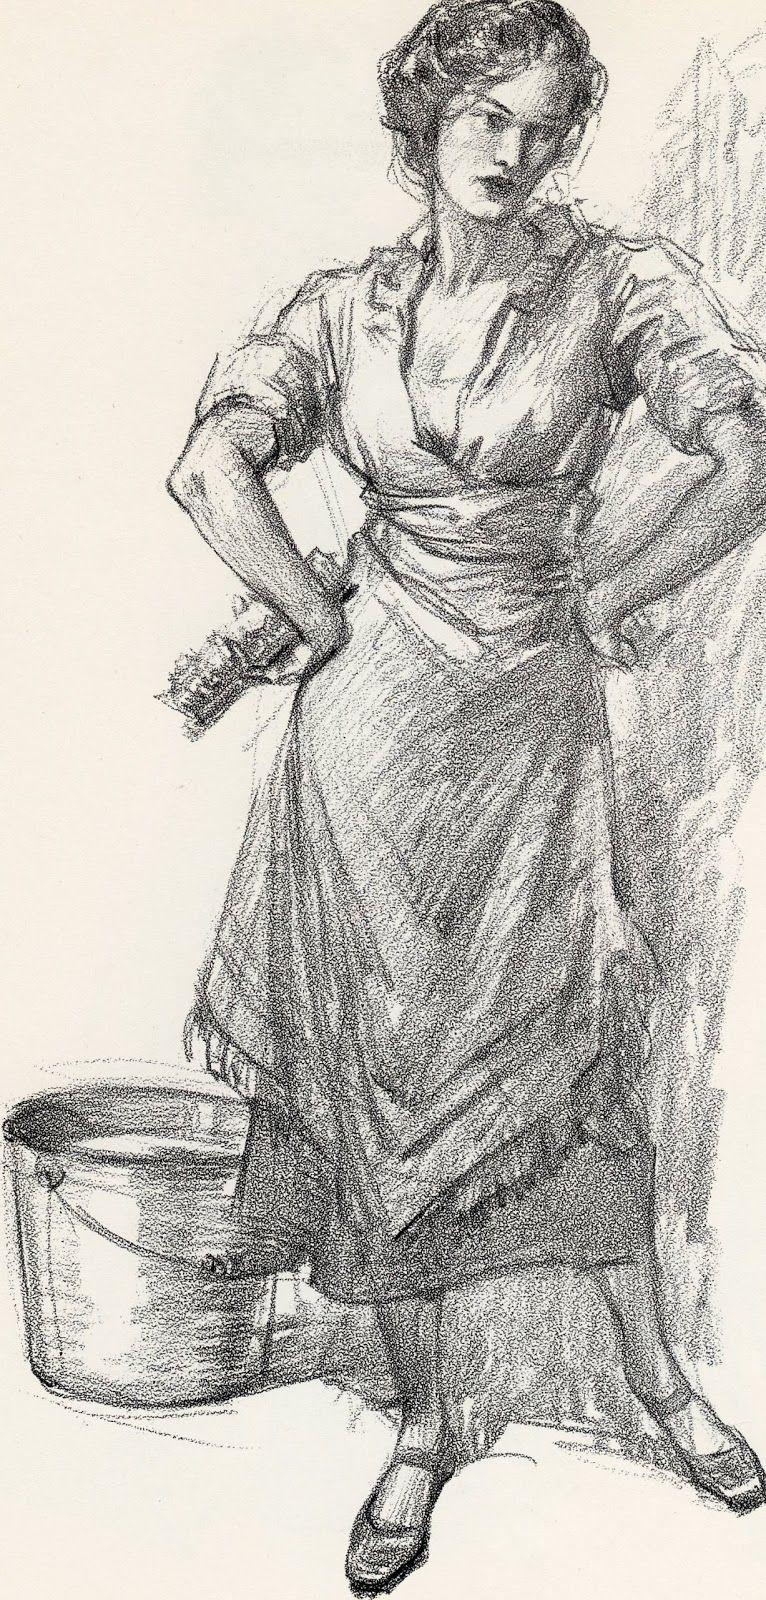 Imgesel Blackwhite Libros De Dibujo Pdf Dibujos De Caras Ve